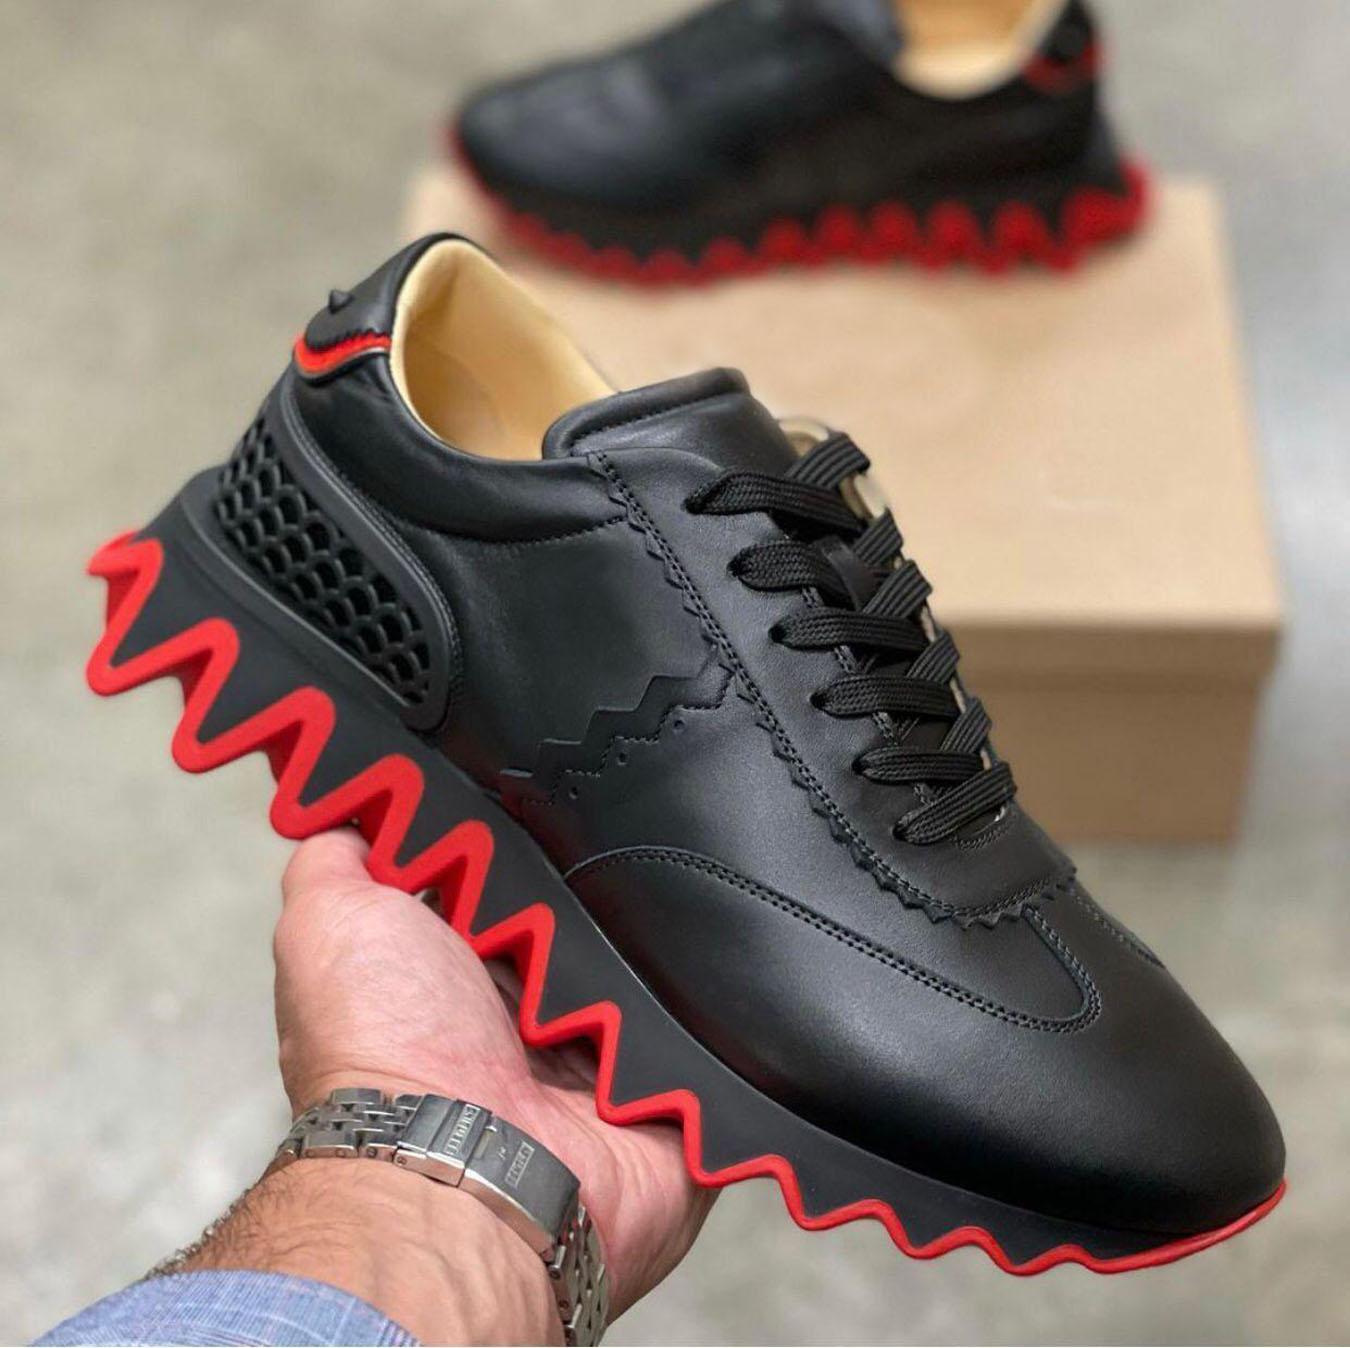 Nome Marca Homens, Mulheres Sapatos Esportivos Spiked Bottomshoes Loubishark Sneakers Flats Couro Spikes Style Andando Perfeito Amor Presente Sola Serrilhas